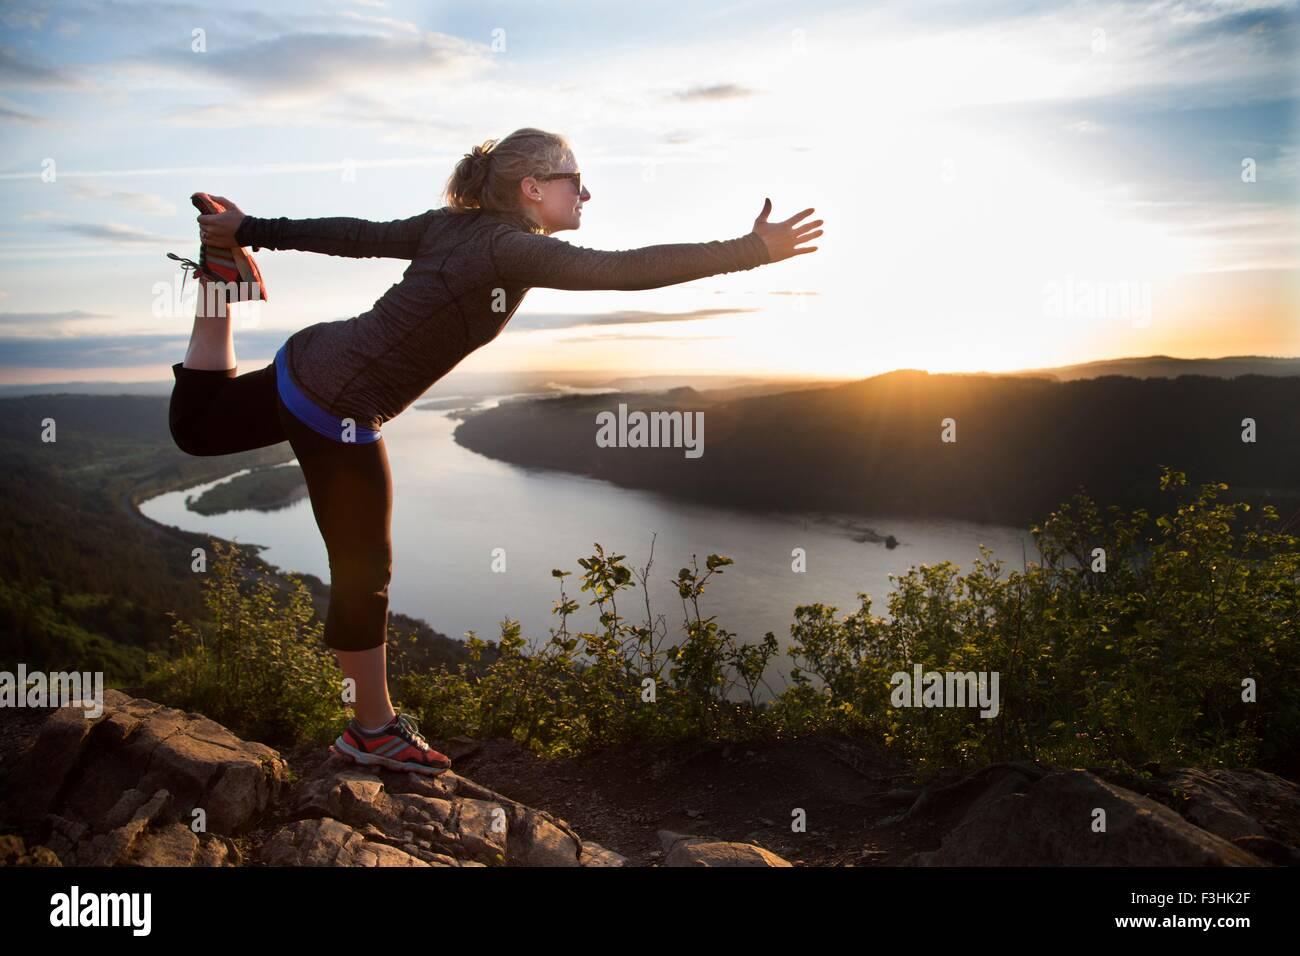 Frau praktizieren Yoga am Berg, Engelsrast, Columbia River Gorge, Oregon, USA Stockfoto